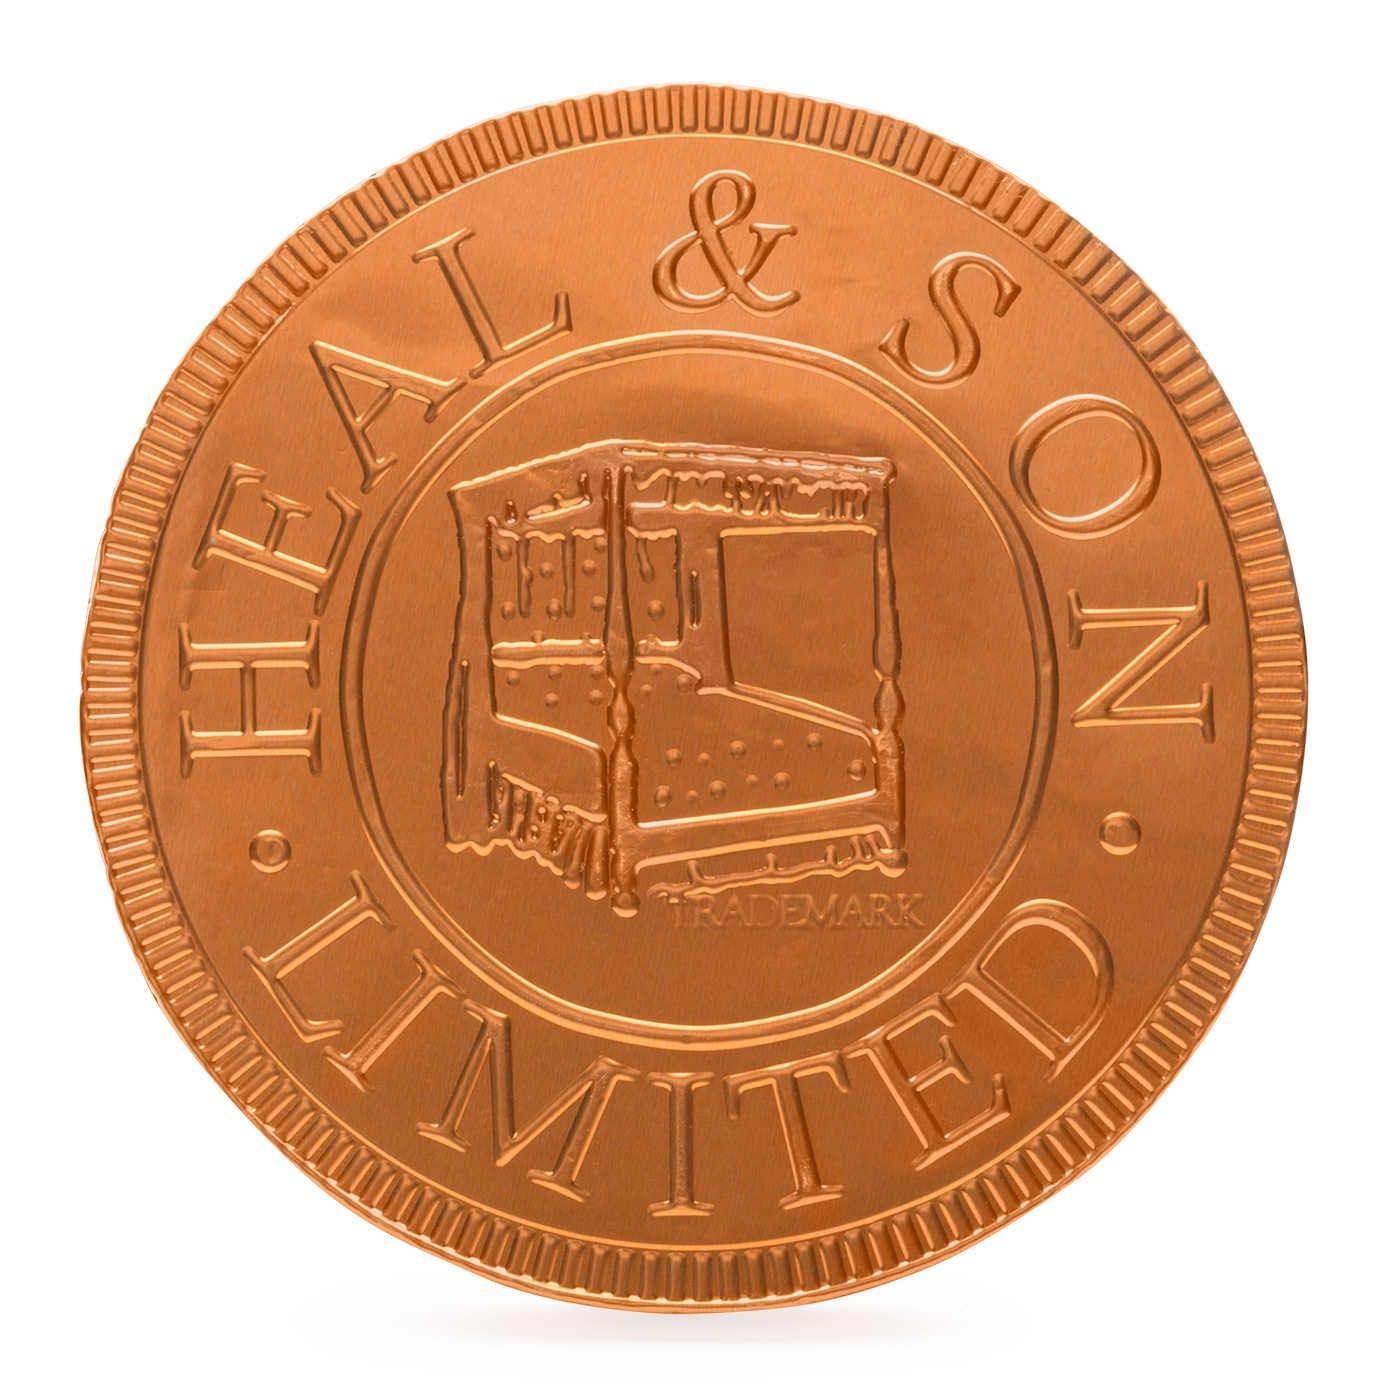 Heal's Chocolate Coin